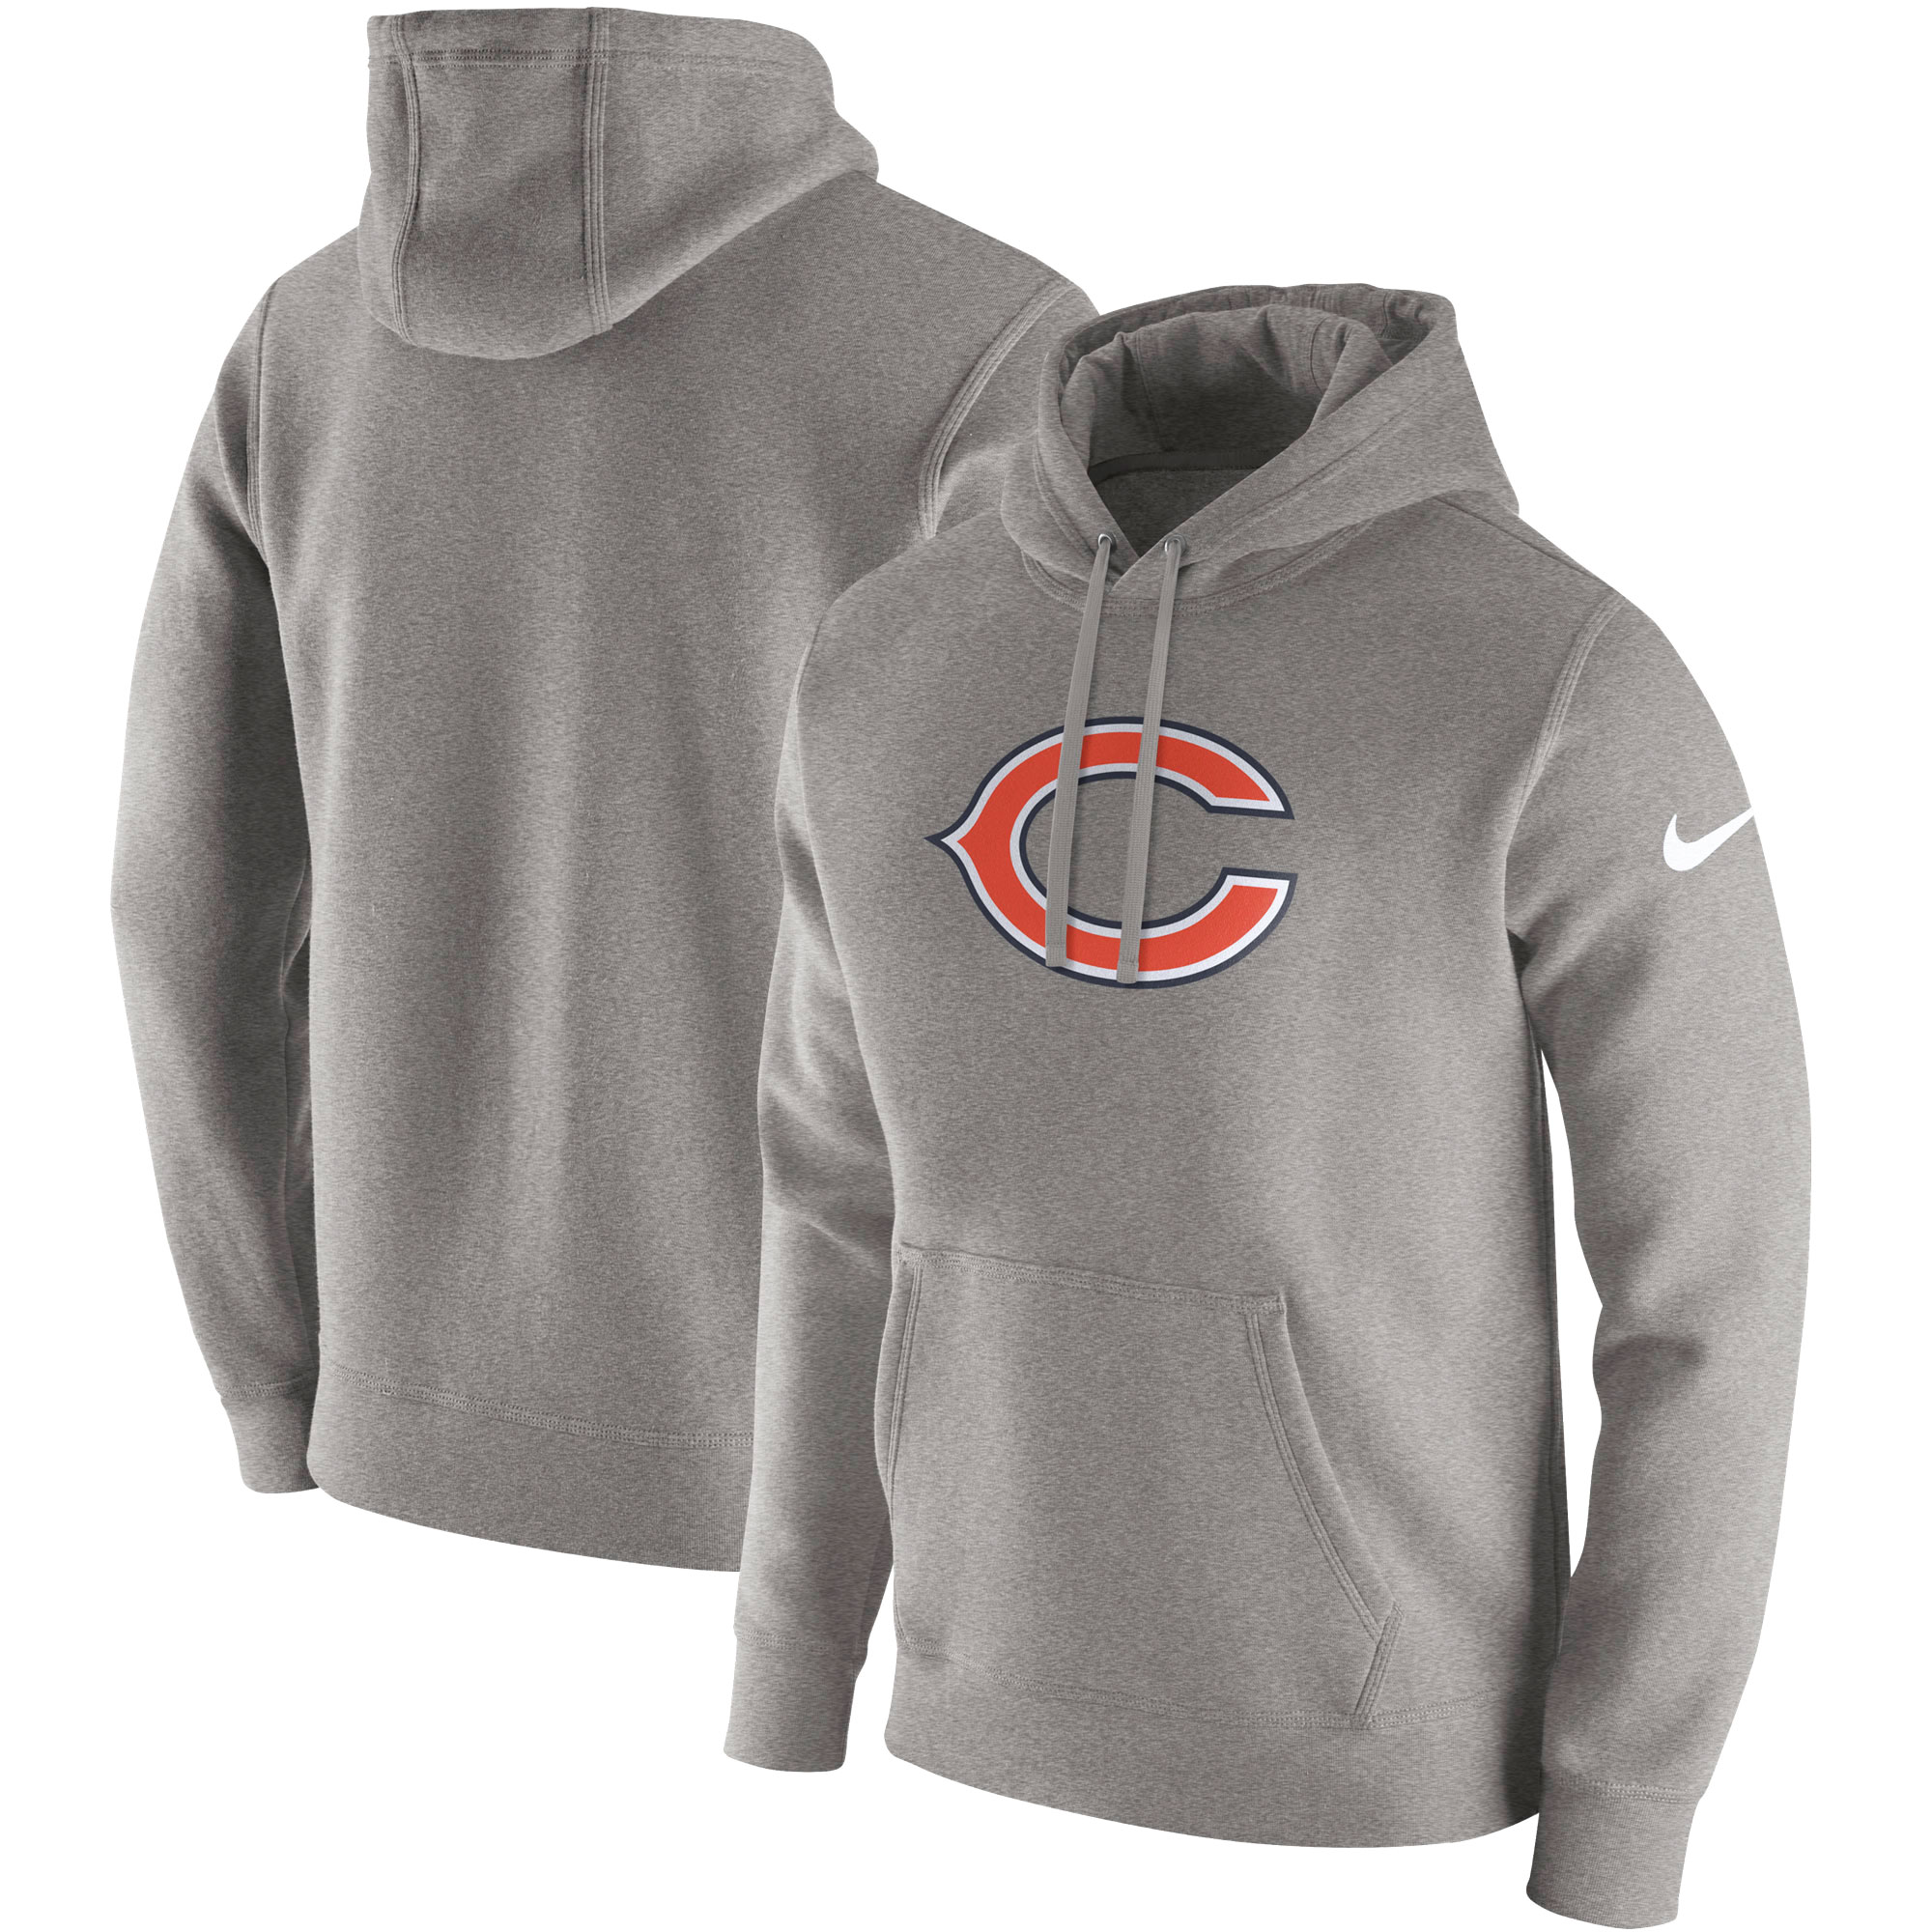 Chicago Bears Nike Club Fleece Pullover Hoodie - Heathered Gray